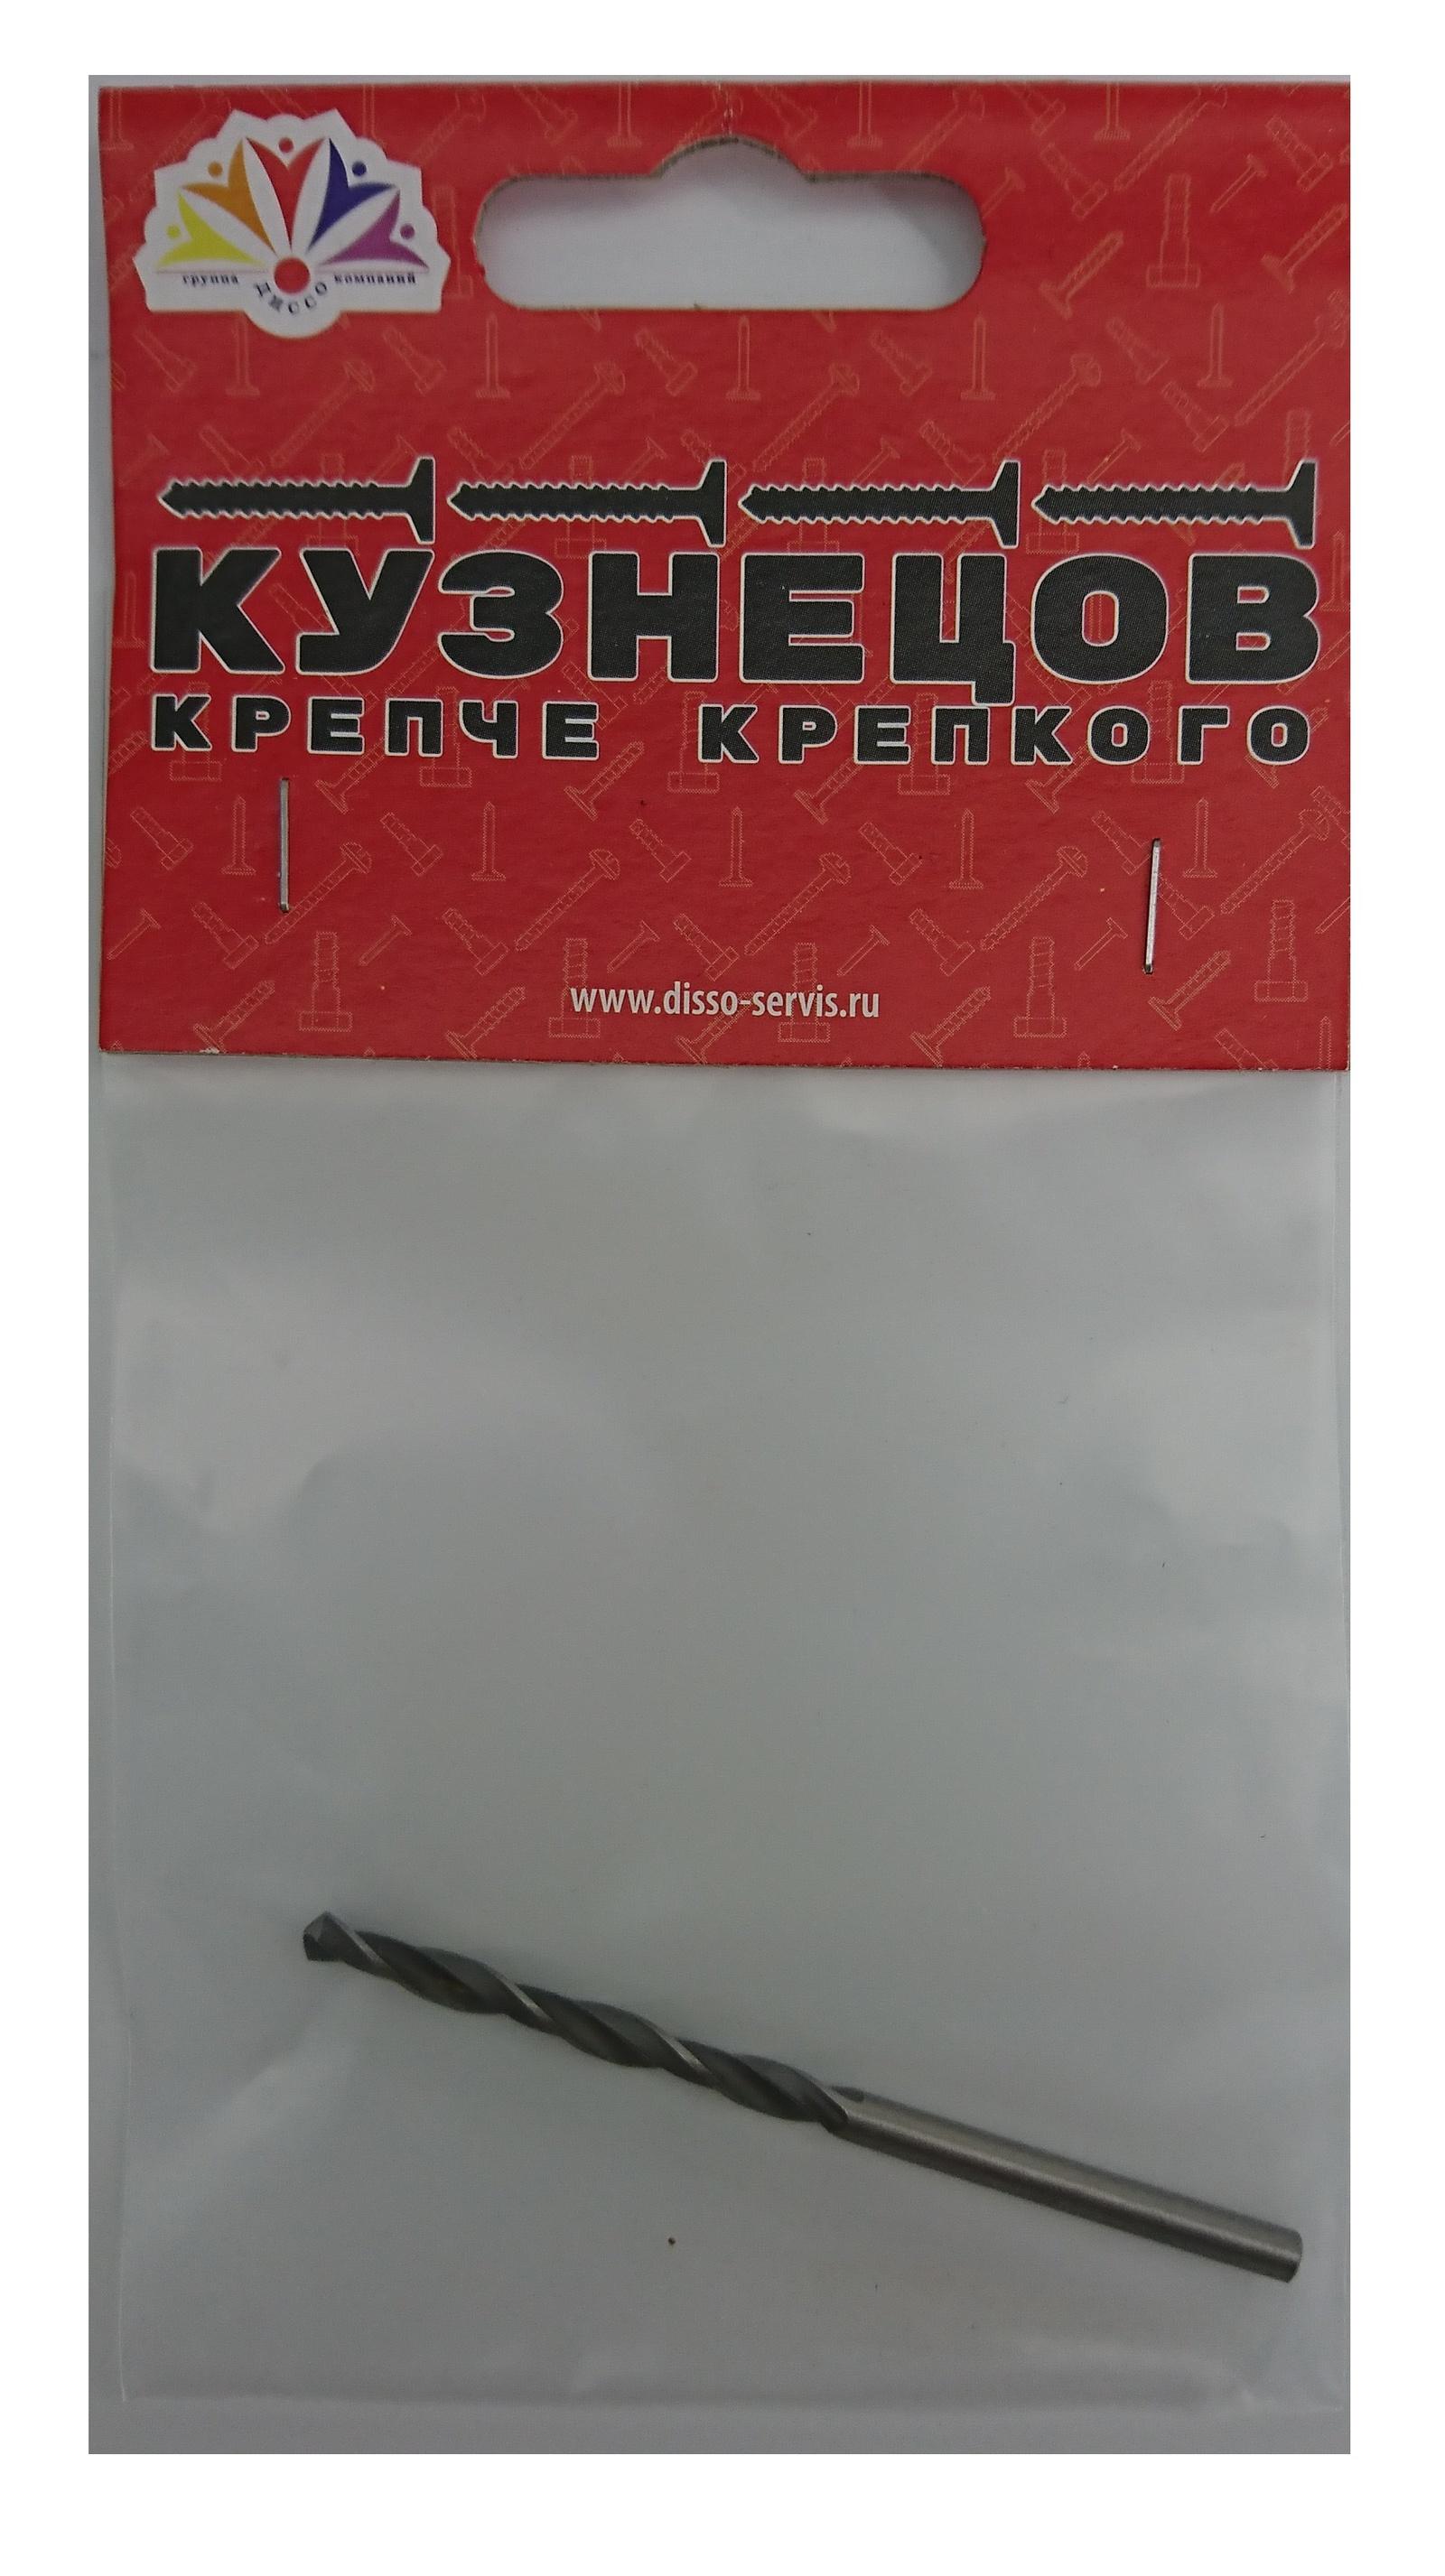 Сверло  по металлу сталь Р6М5 L=70 Диаметр 3,5 мм (1 шт) пак.